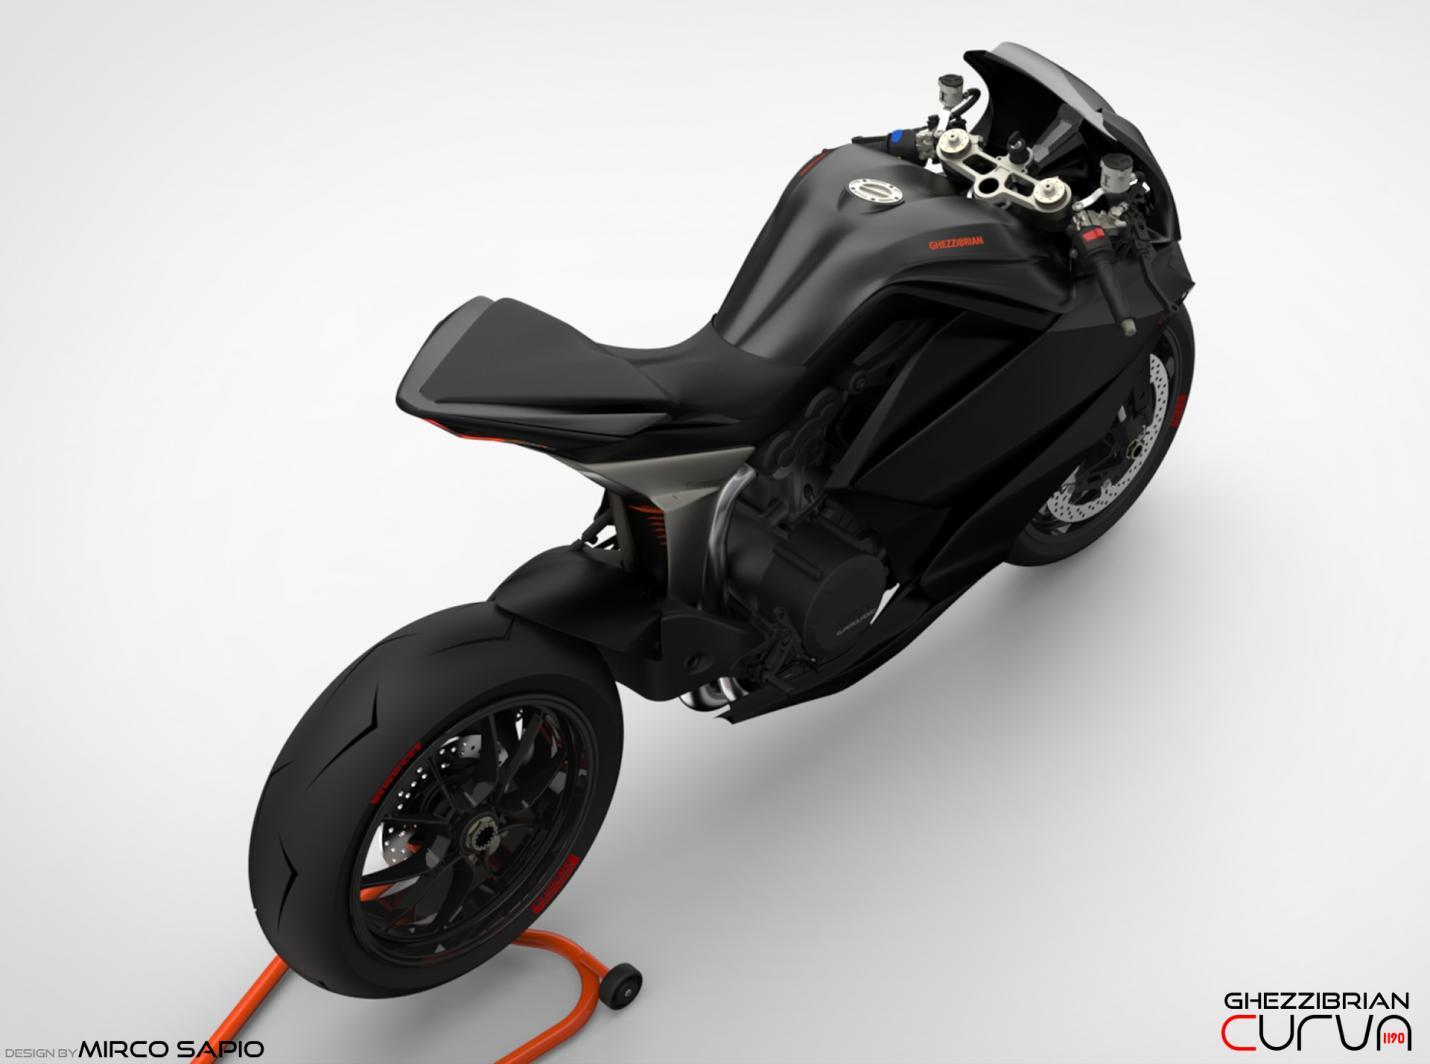 Ducati Panigale Curva 1190 By Ghezzi Brian And Mirco